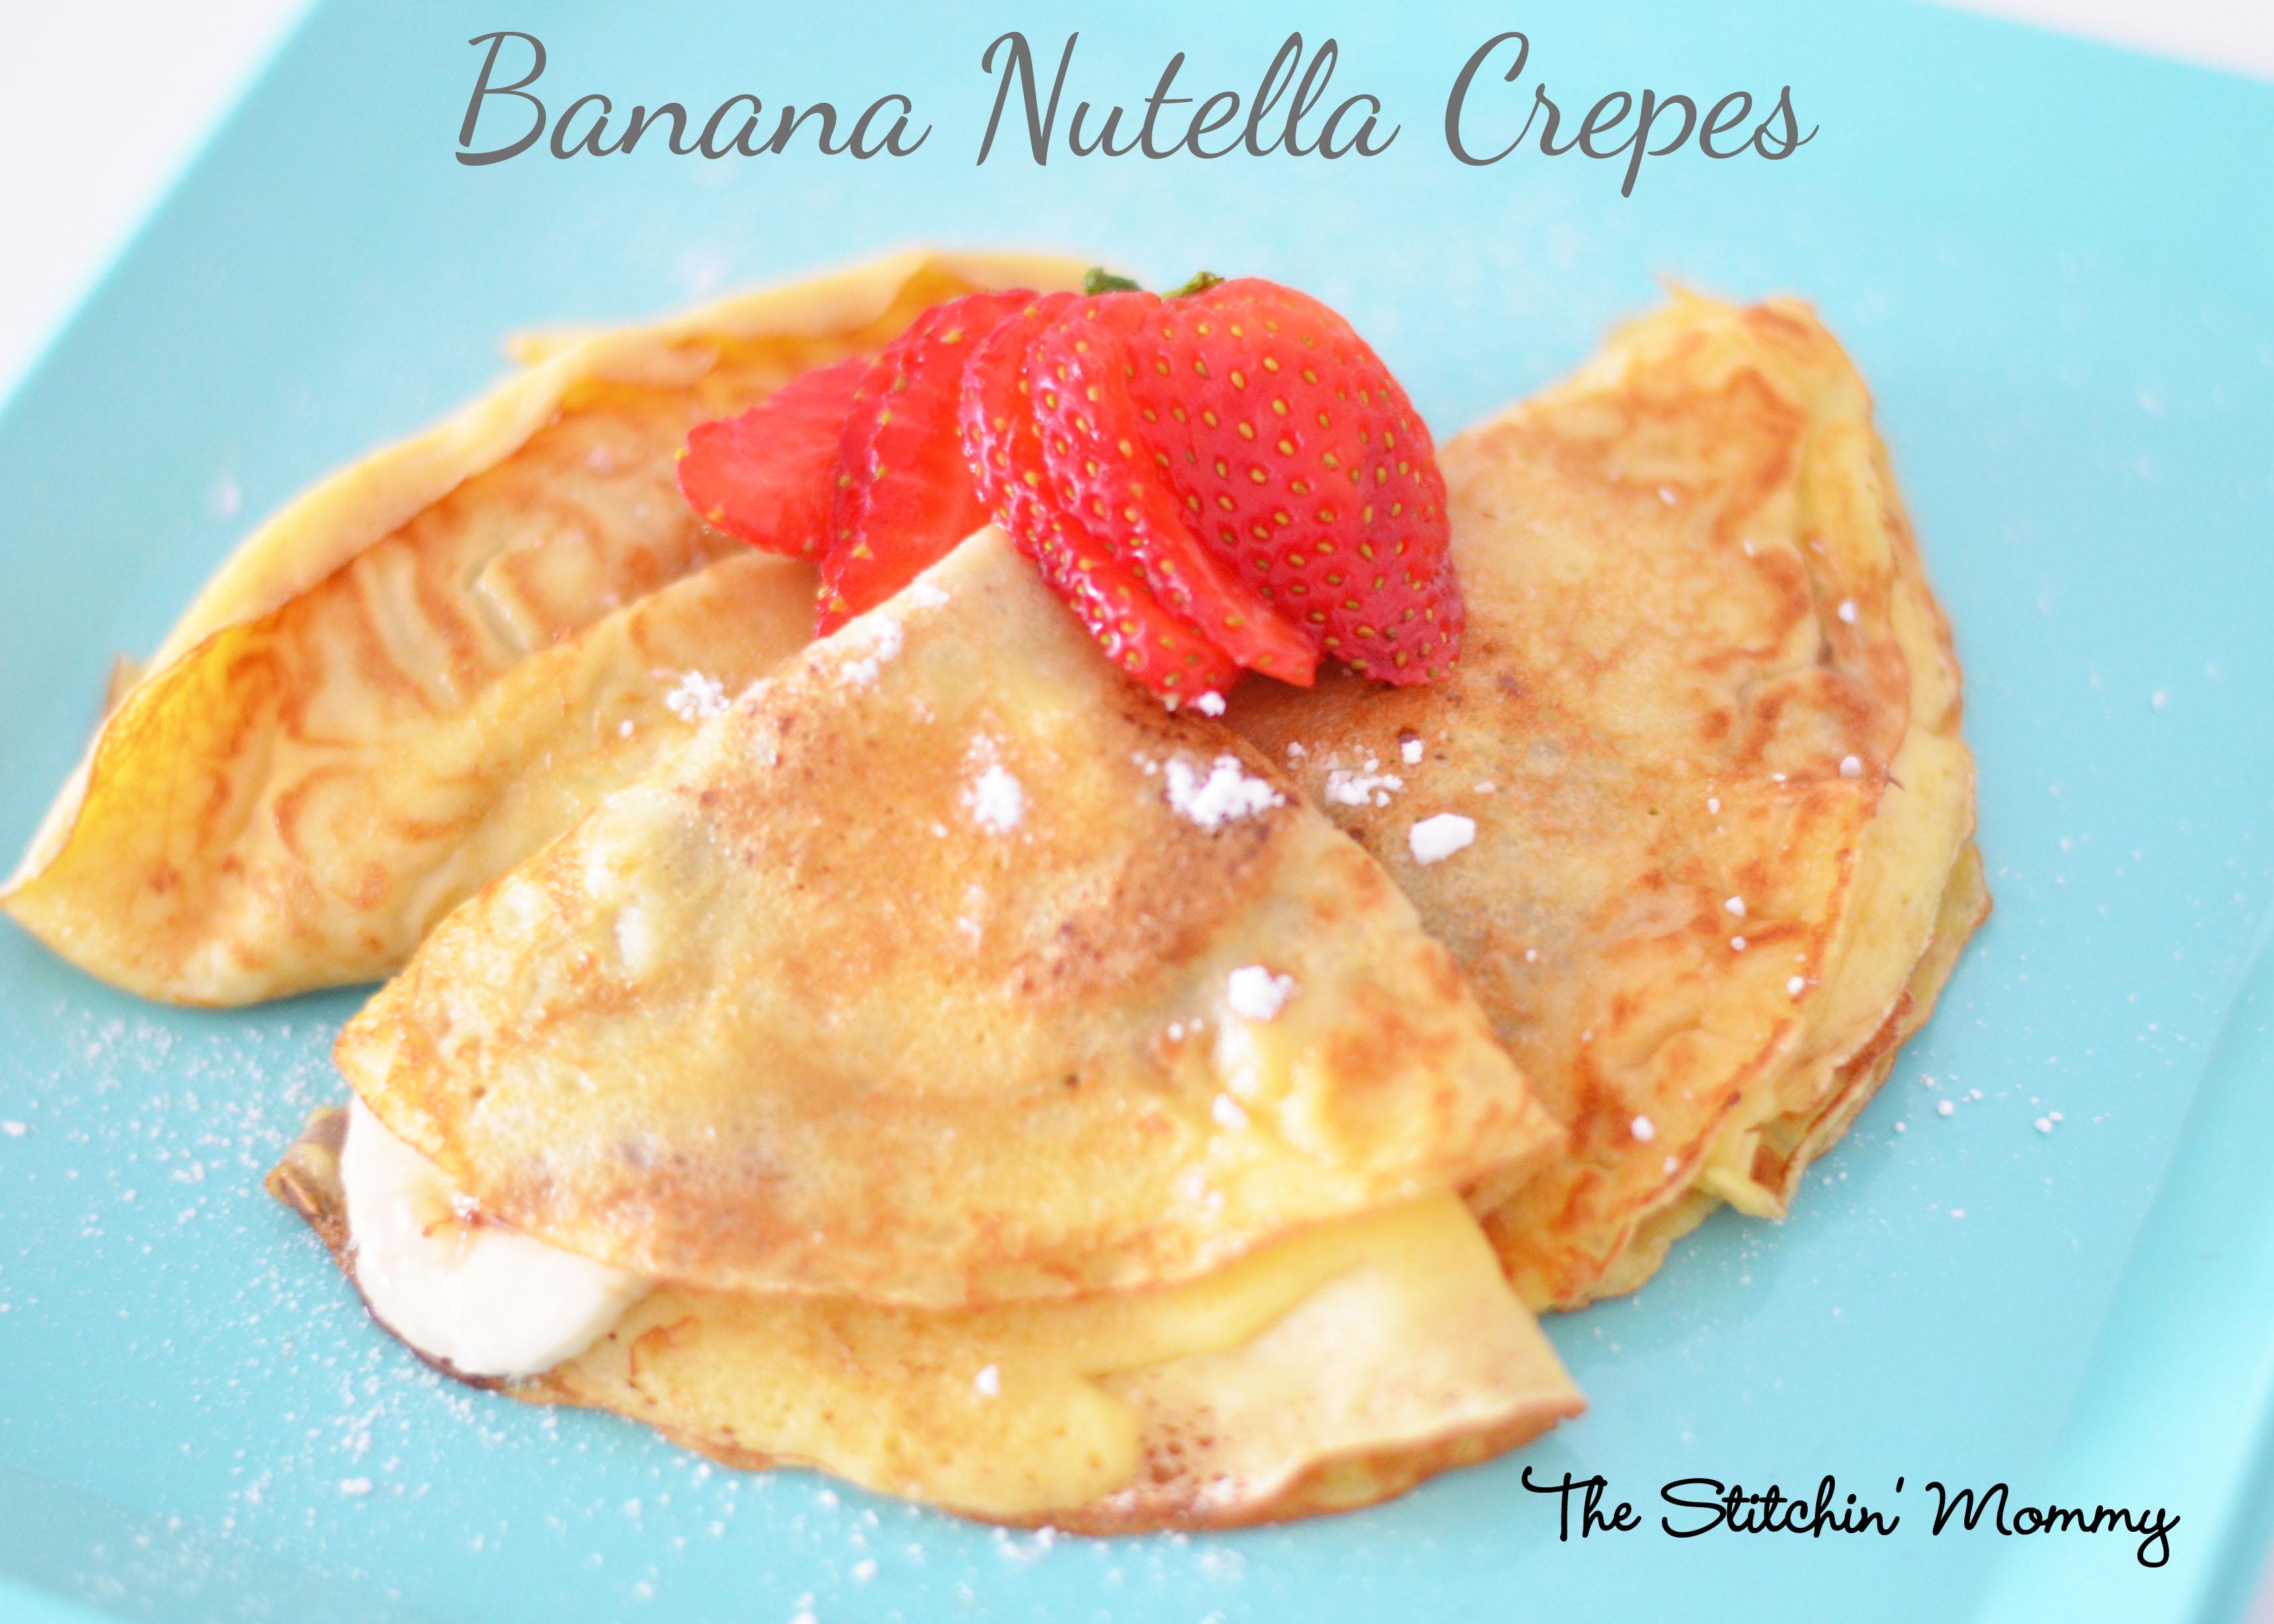 Banana Nutella Crepes - The Stitchin Mommy